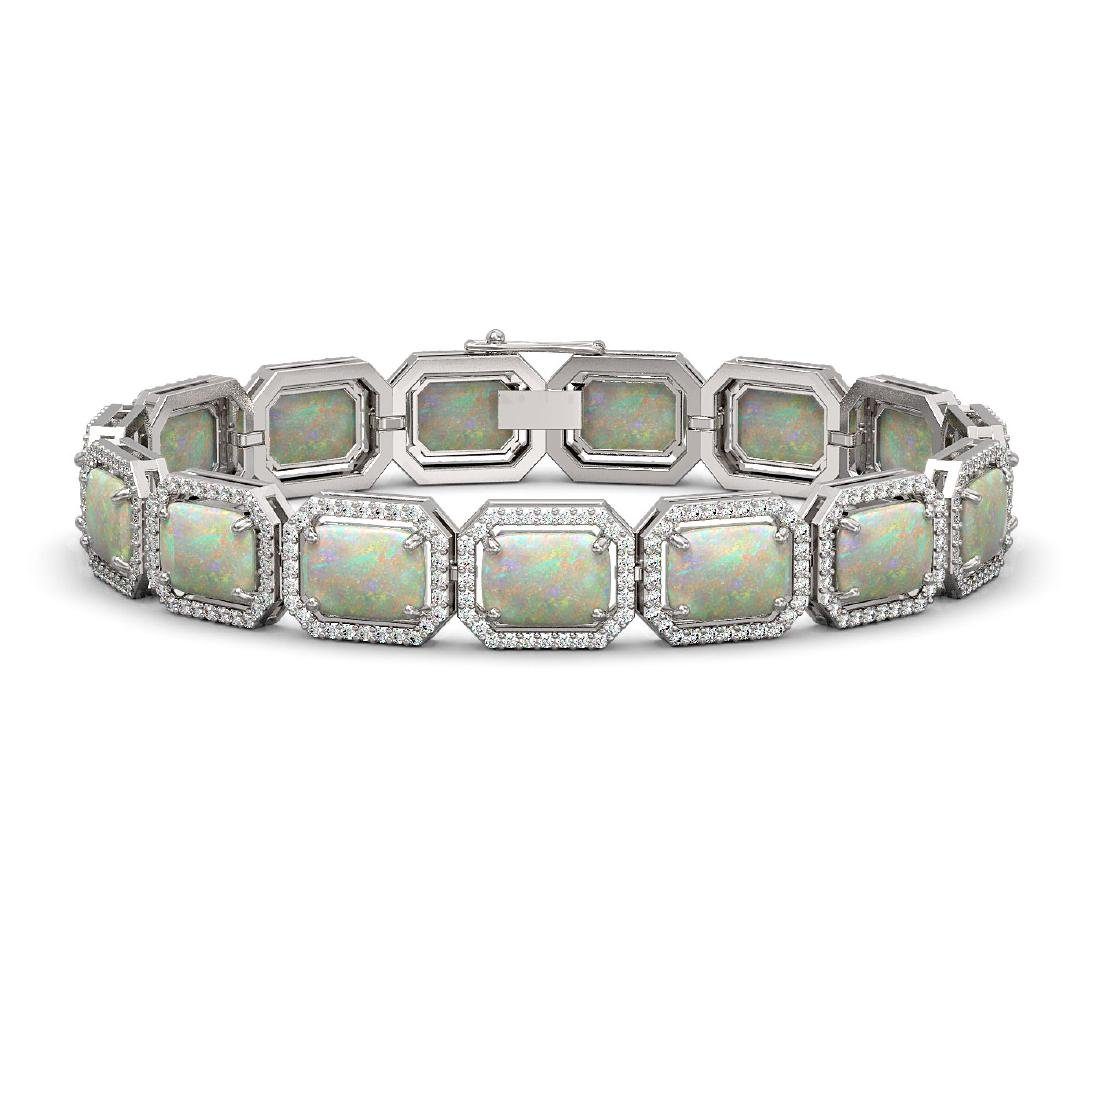 24.37 CTW Opal & Diamond Halo Bracelet 10K White Gold